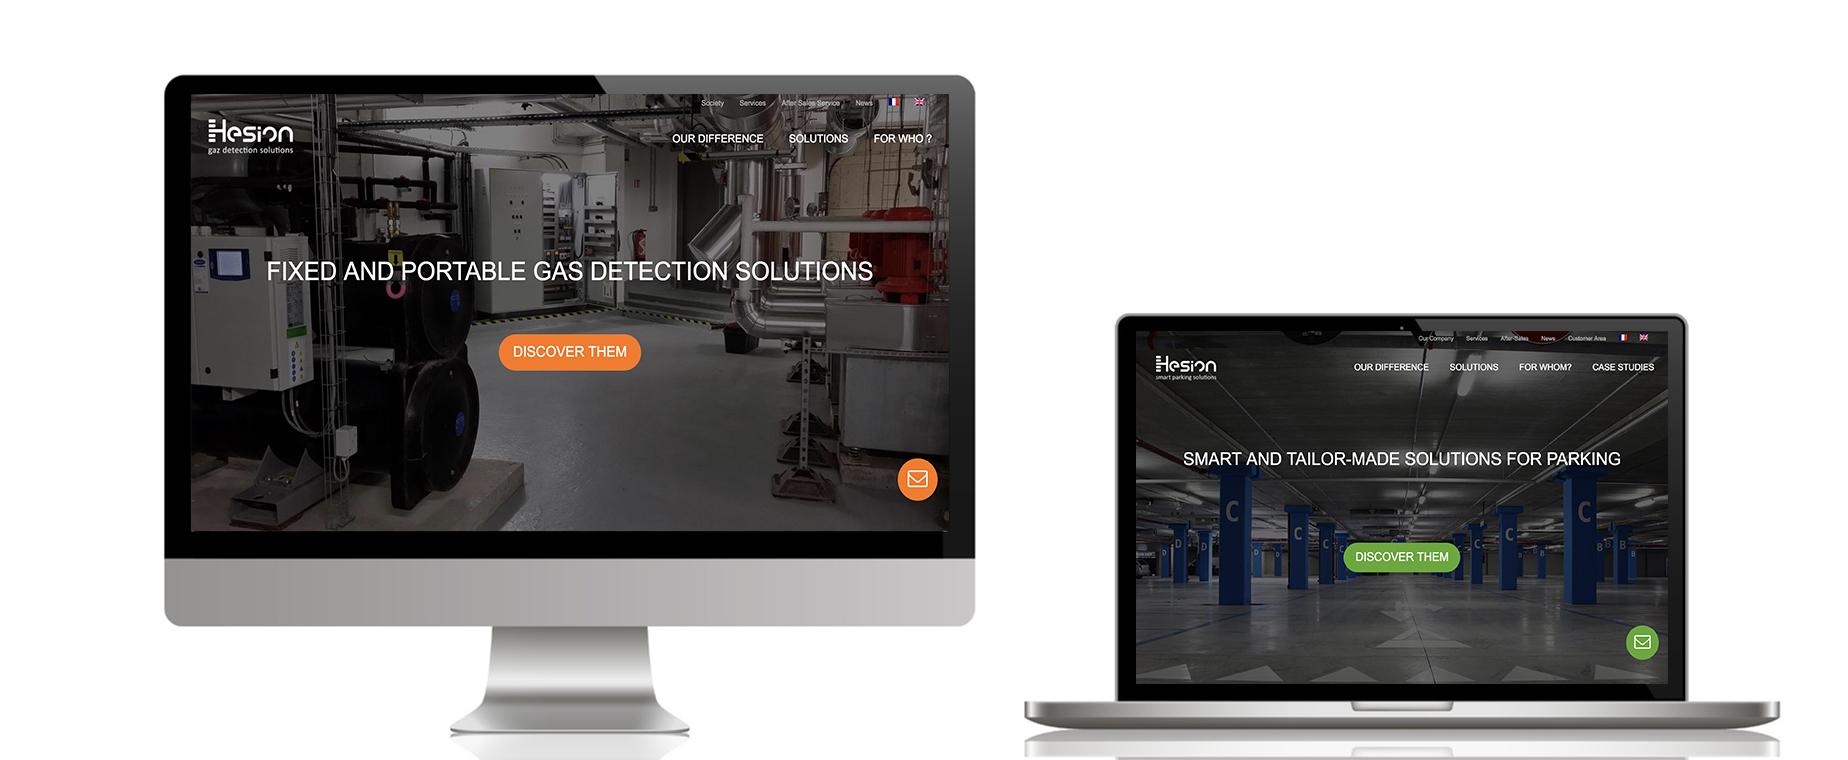 hesion-sites-internet